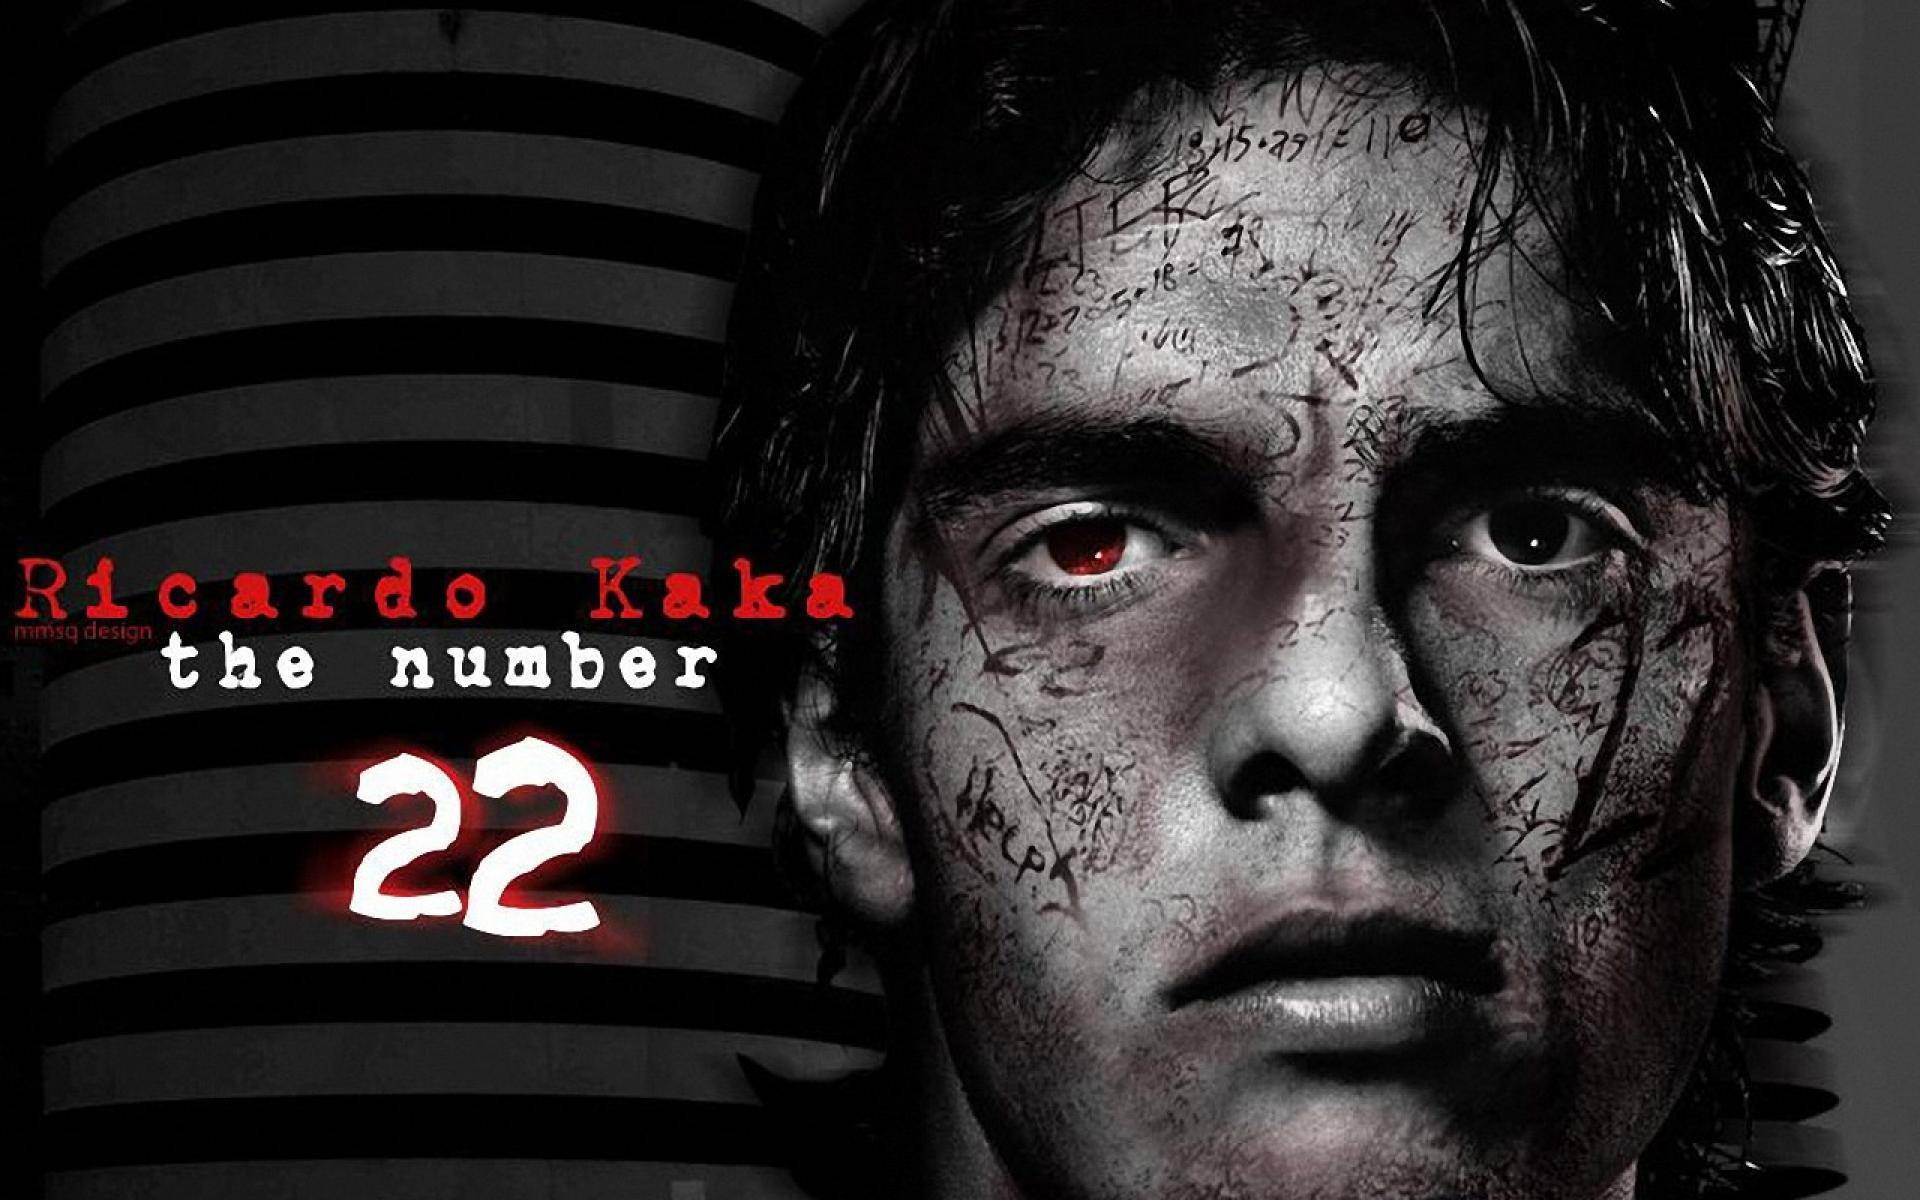 Ricardo Kaka 22 Wallpaper   Football HD Wallpapers 1920x1200